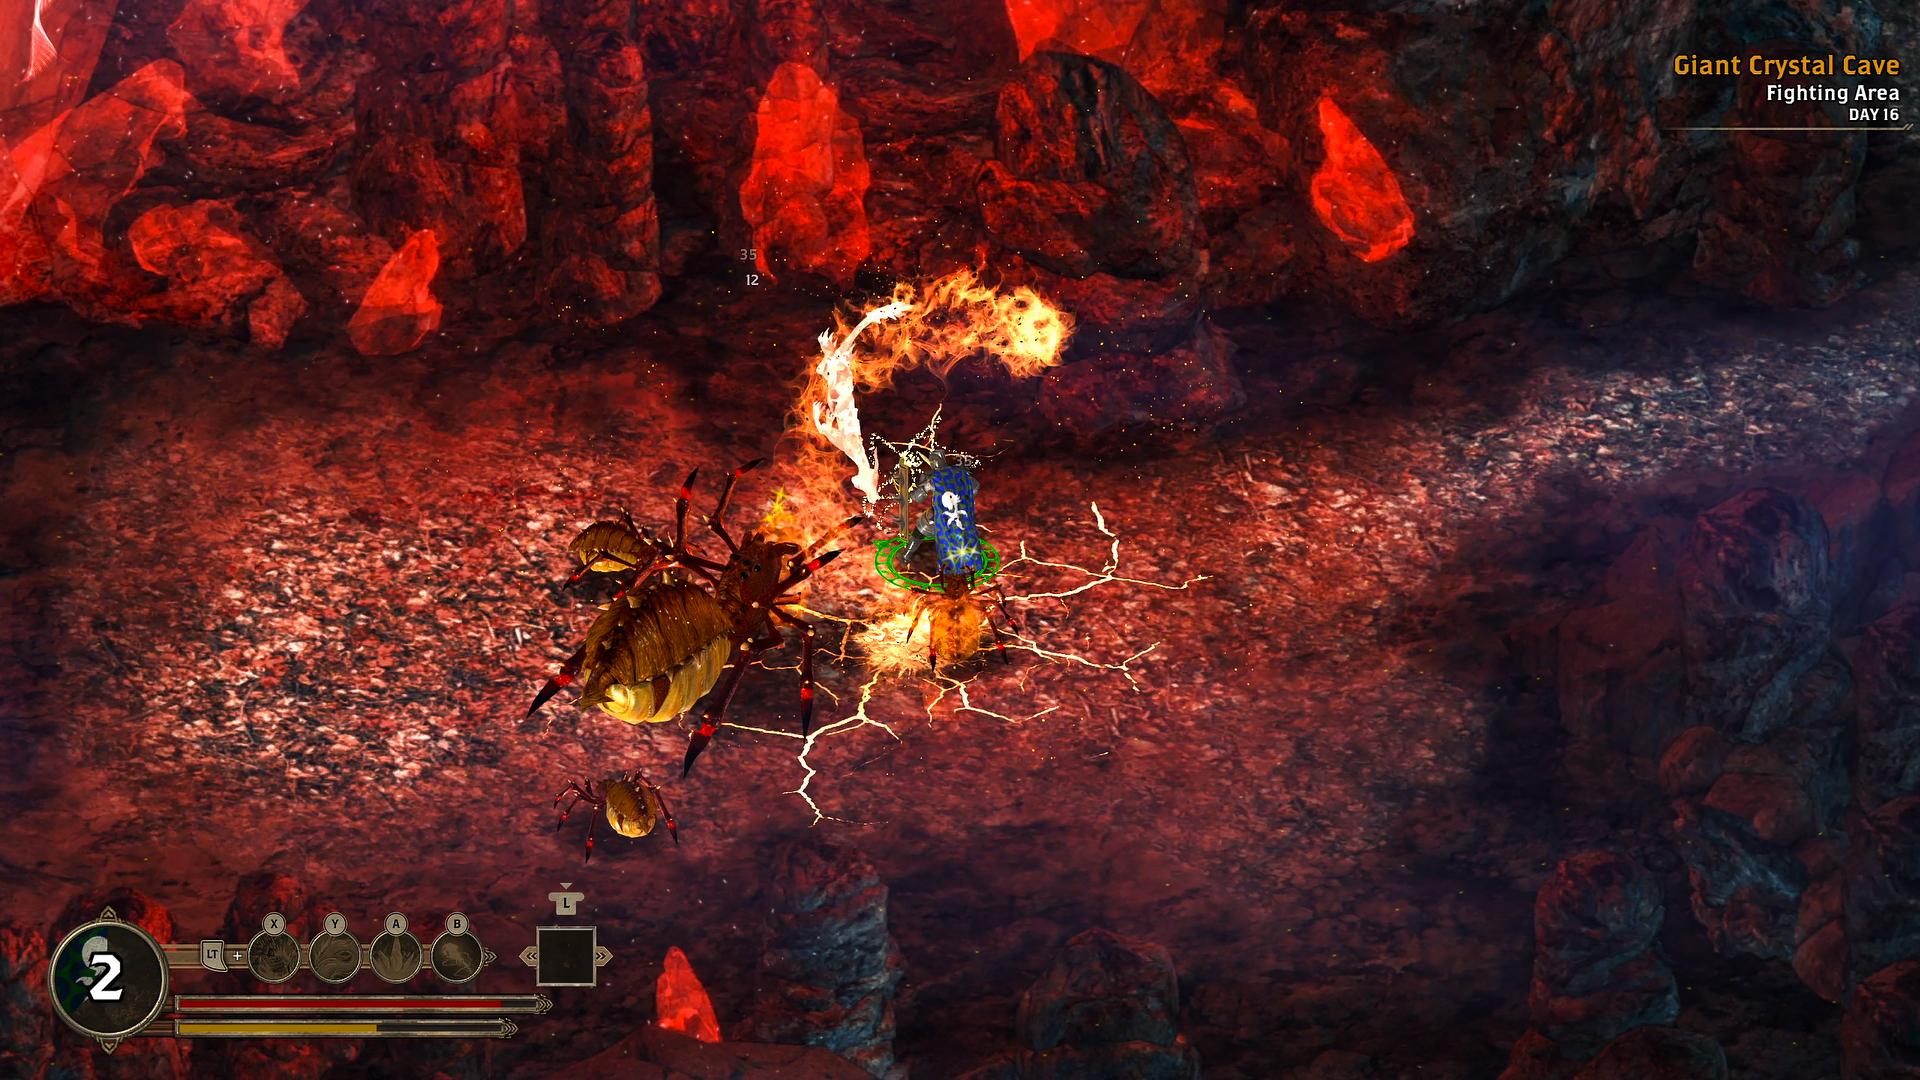 8baf51f0e2ae648692e974c7bd11c6944844c76c | RPG Jeuxvidéo